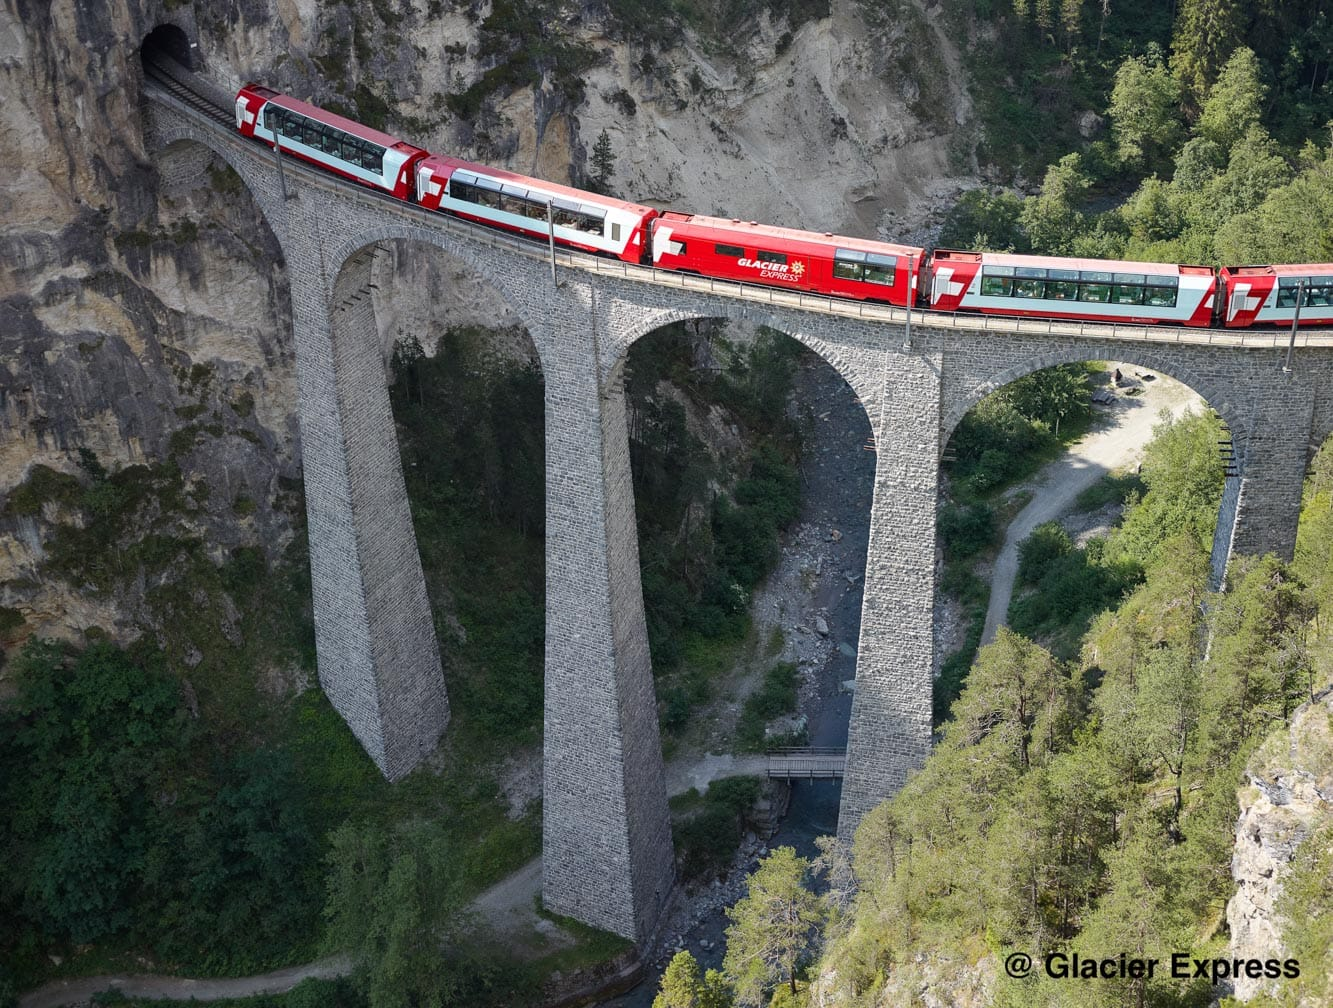 Glacier Express train on a bridge